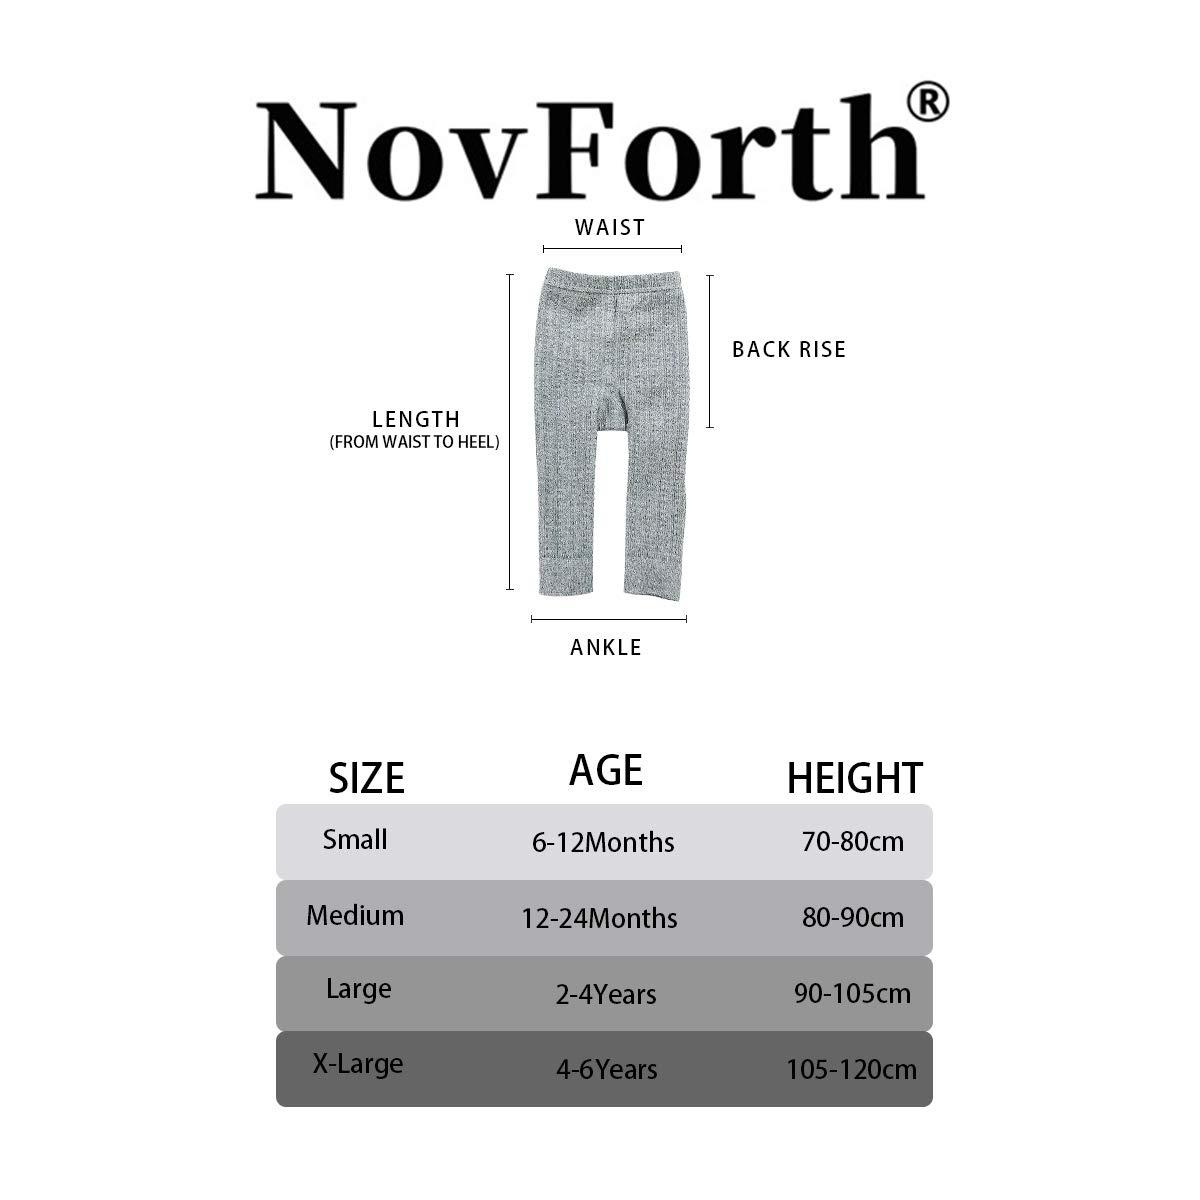 NovForth Toddler Tights Knit Legging Pants Baby Girl Footless Stockings